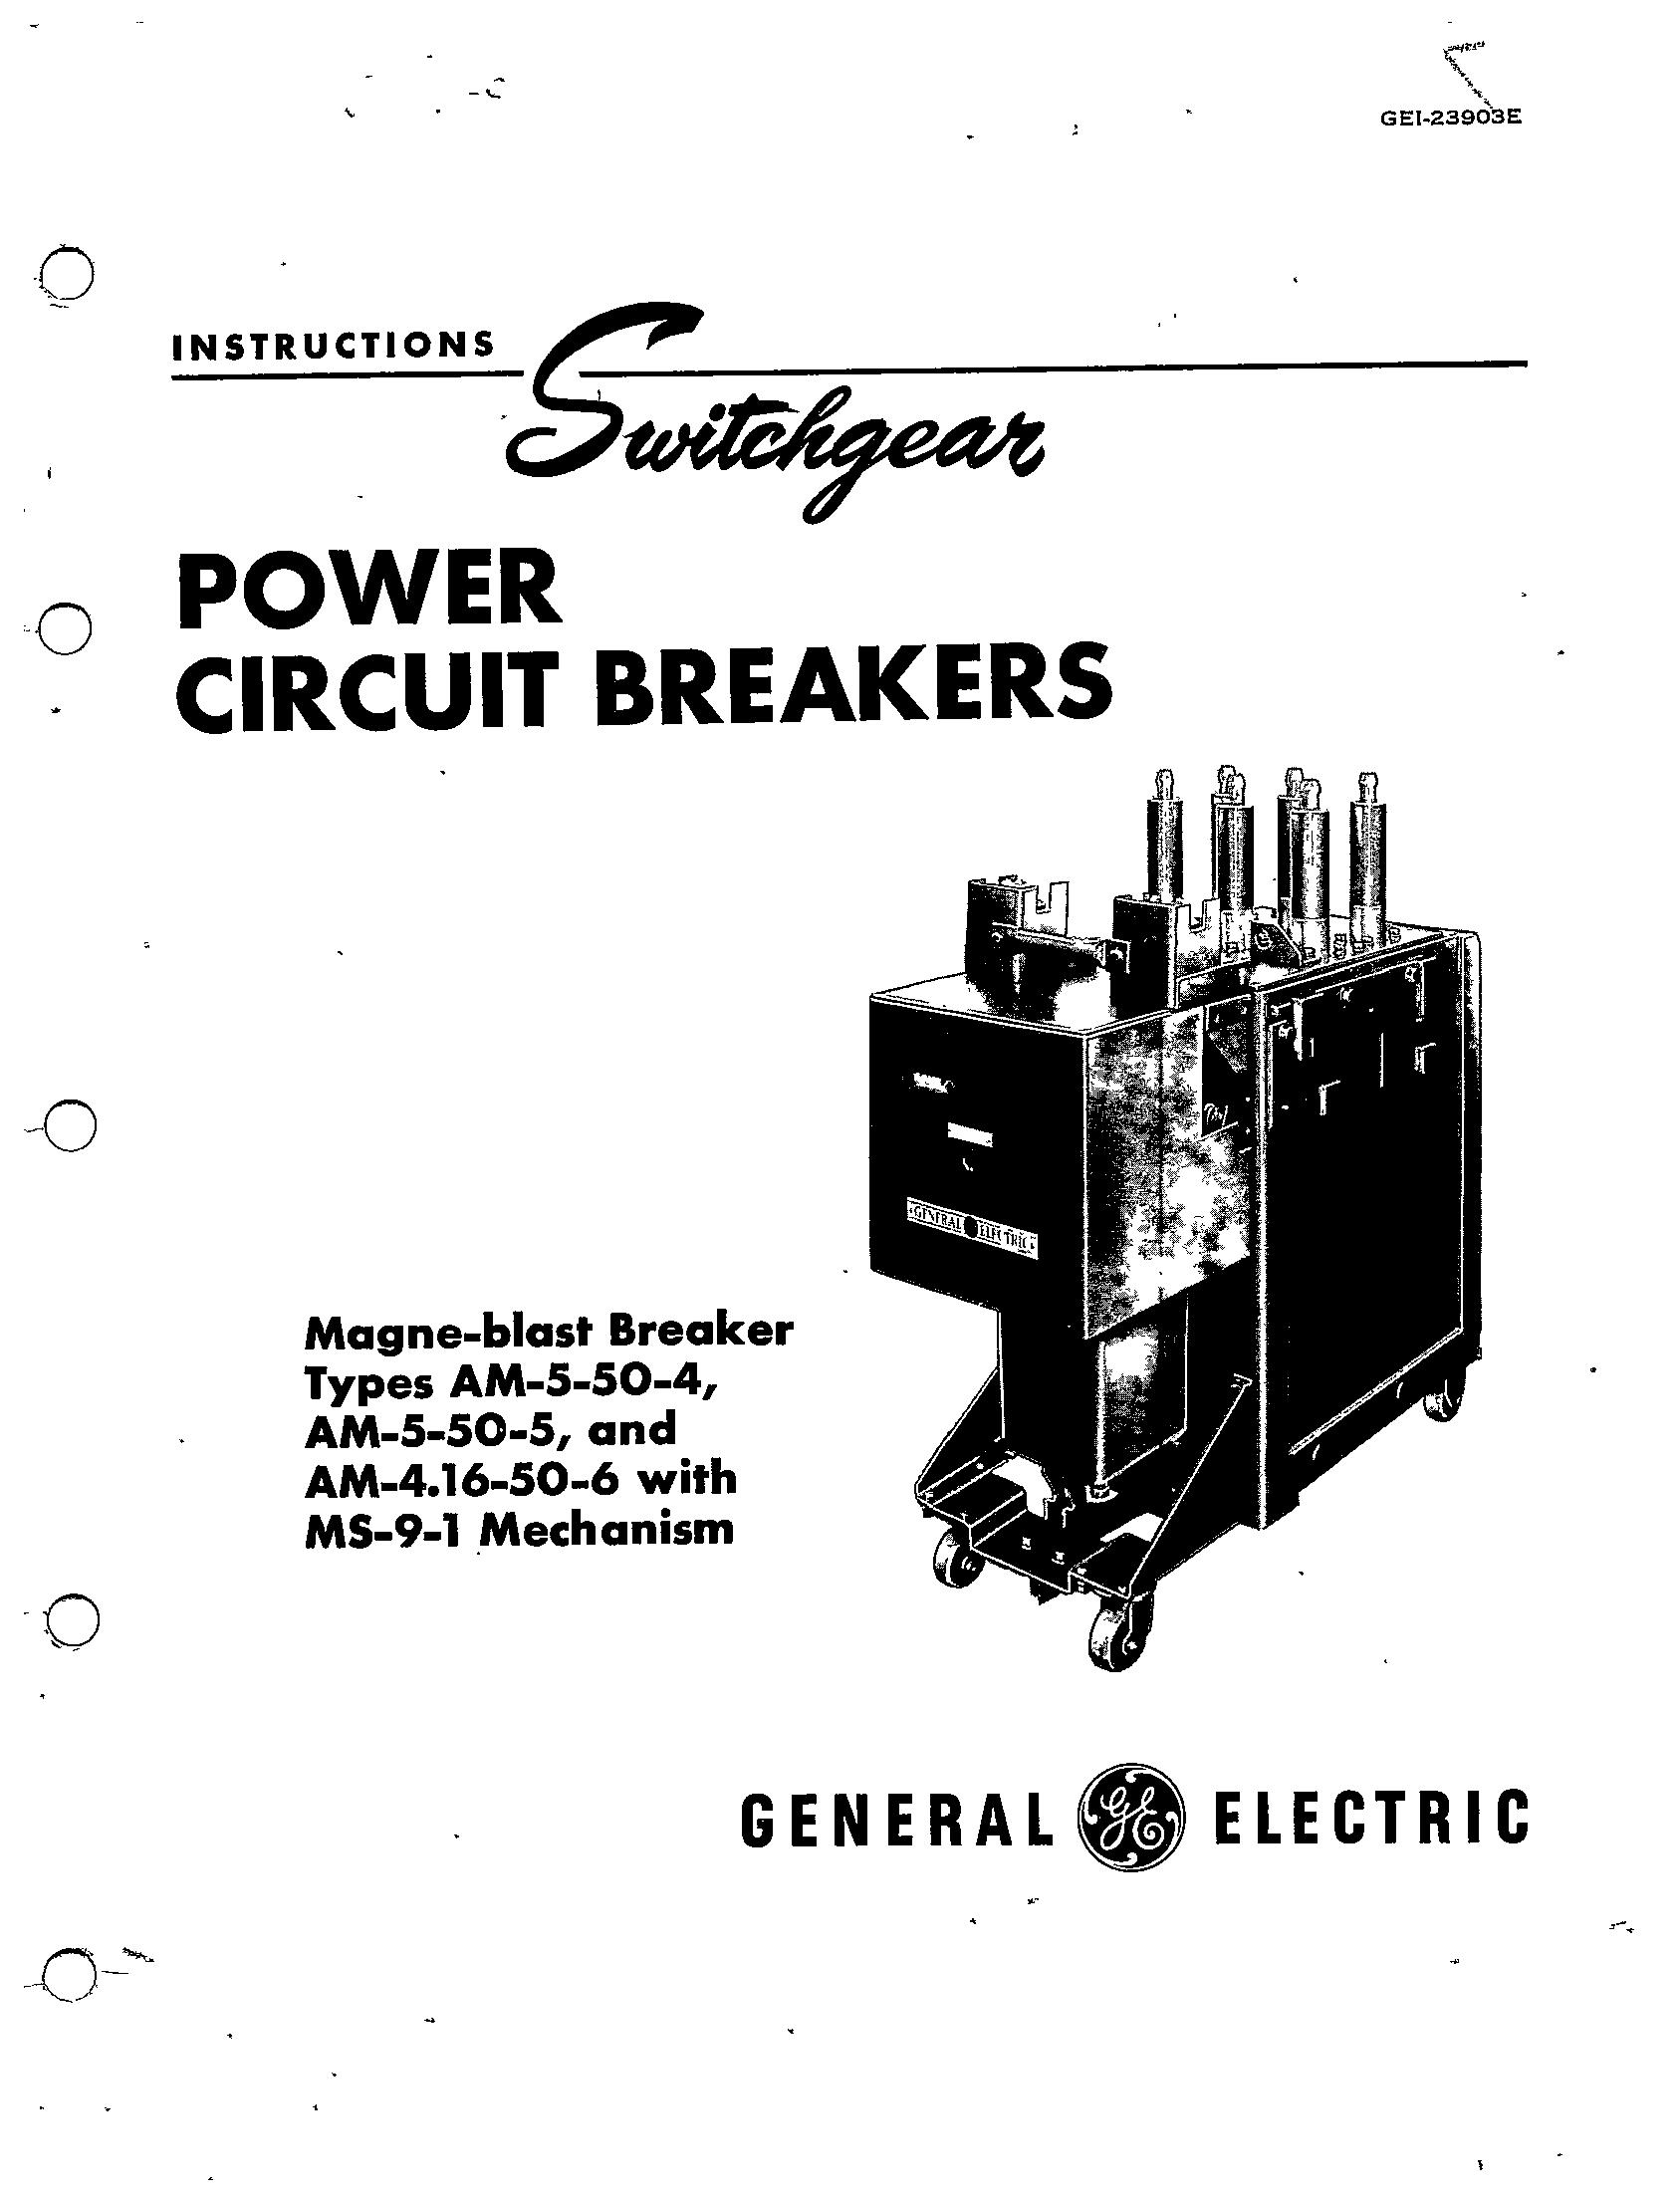 Gei E Power Circuit Breakers Magne Blast Breaker